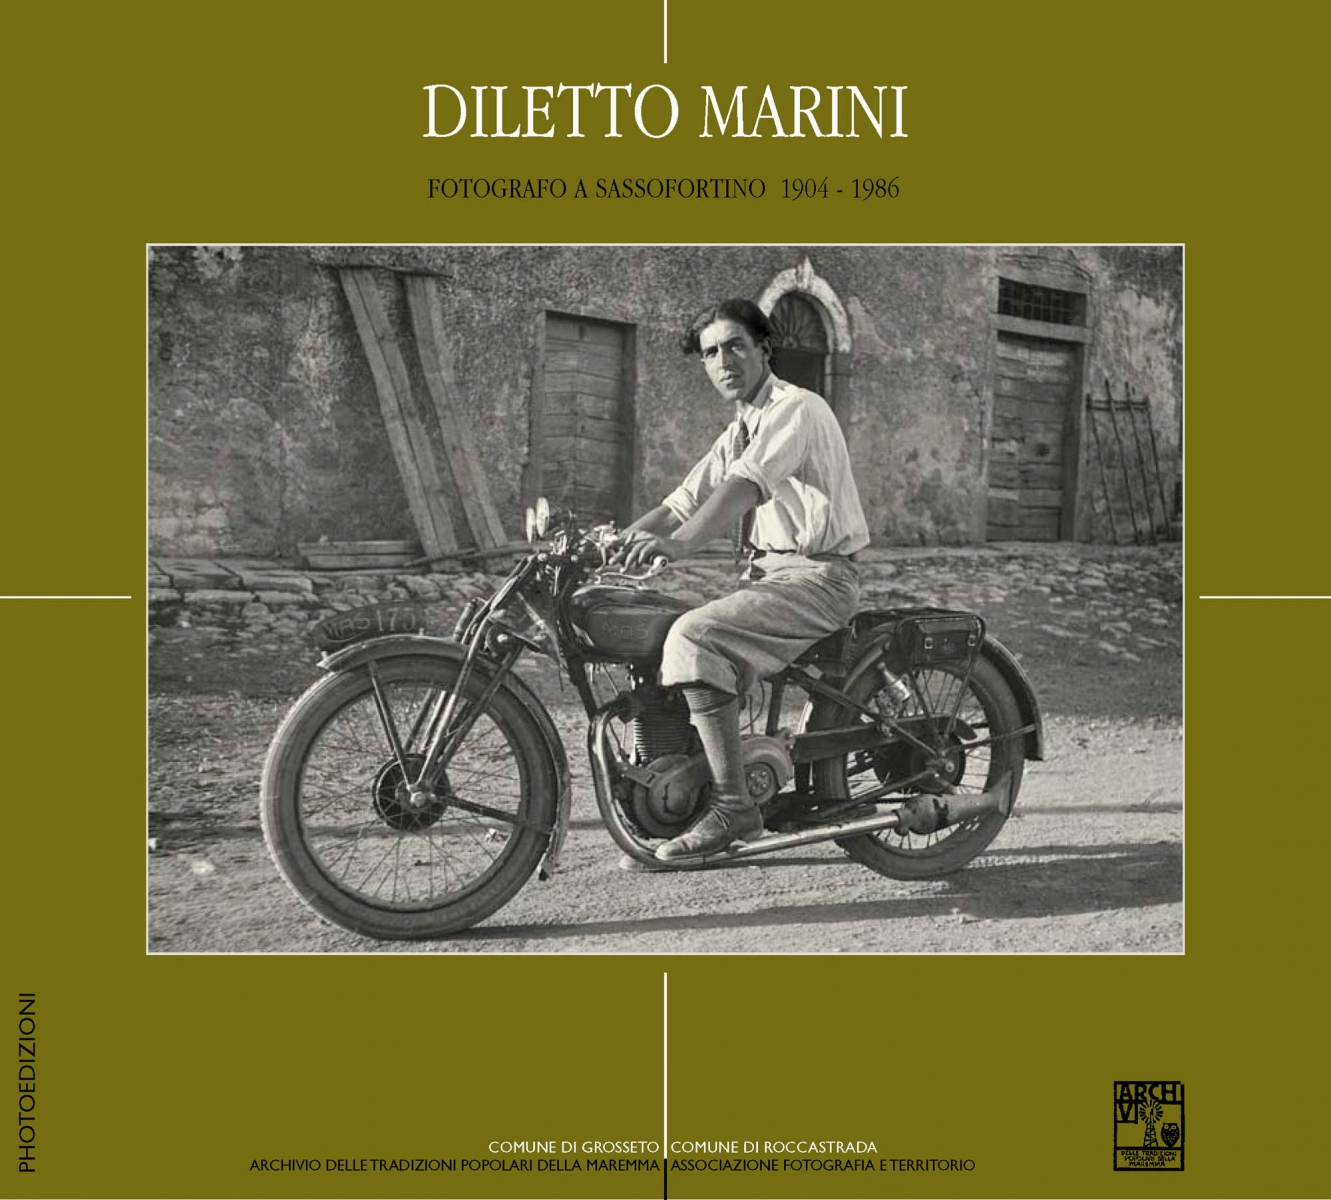 Diletto Marini